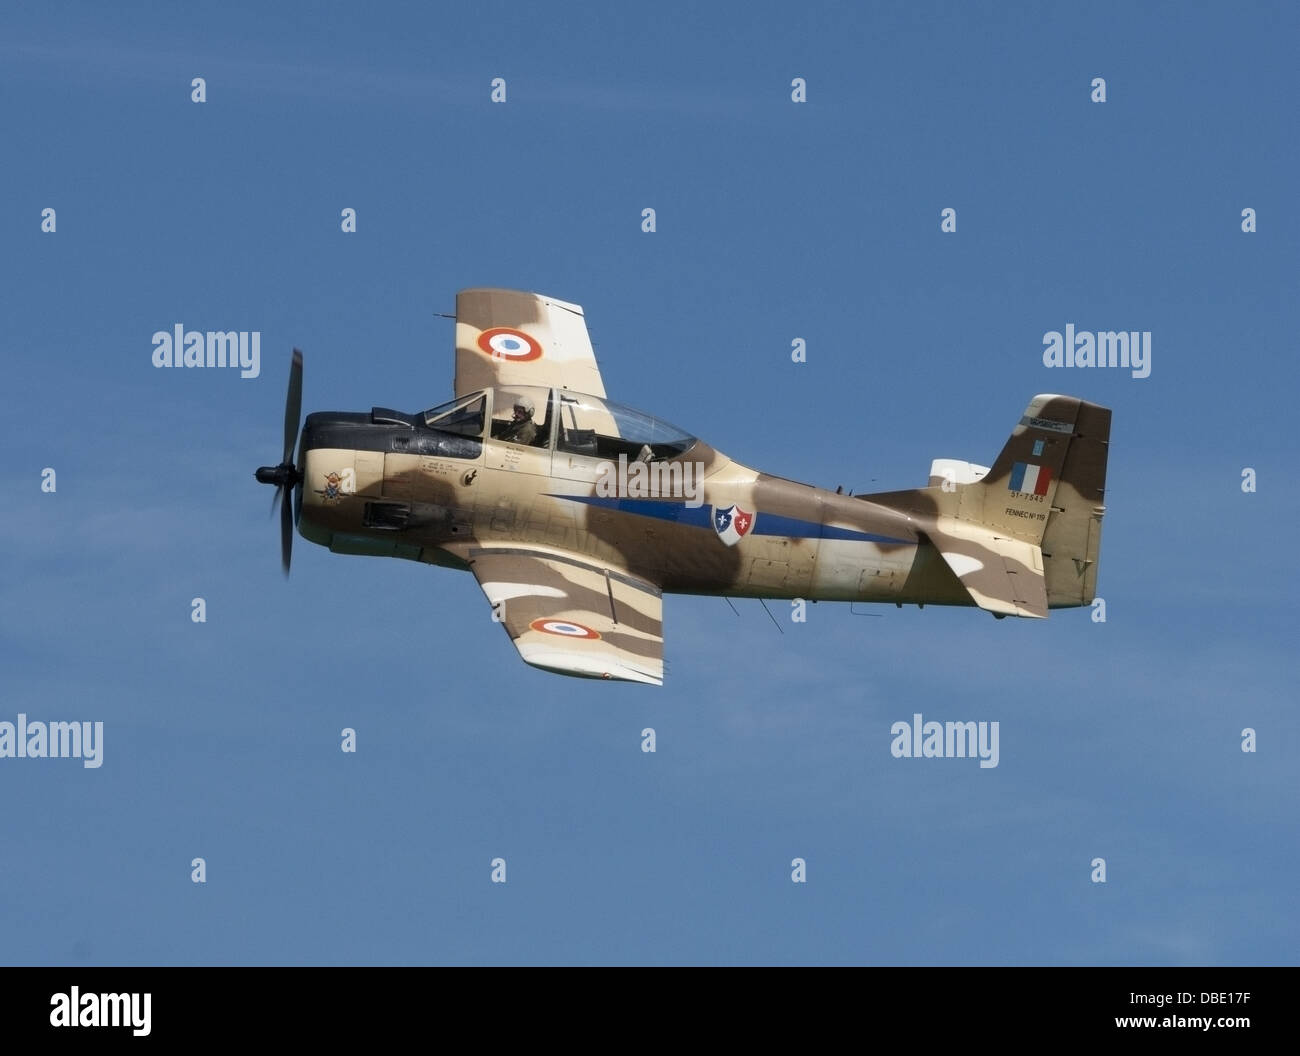 T-28 Fennec - Stock Image